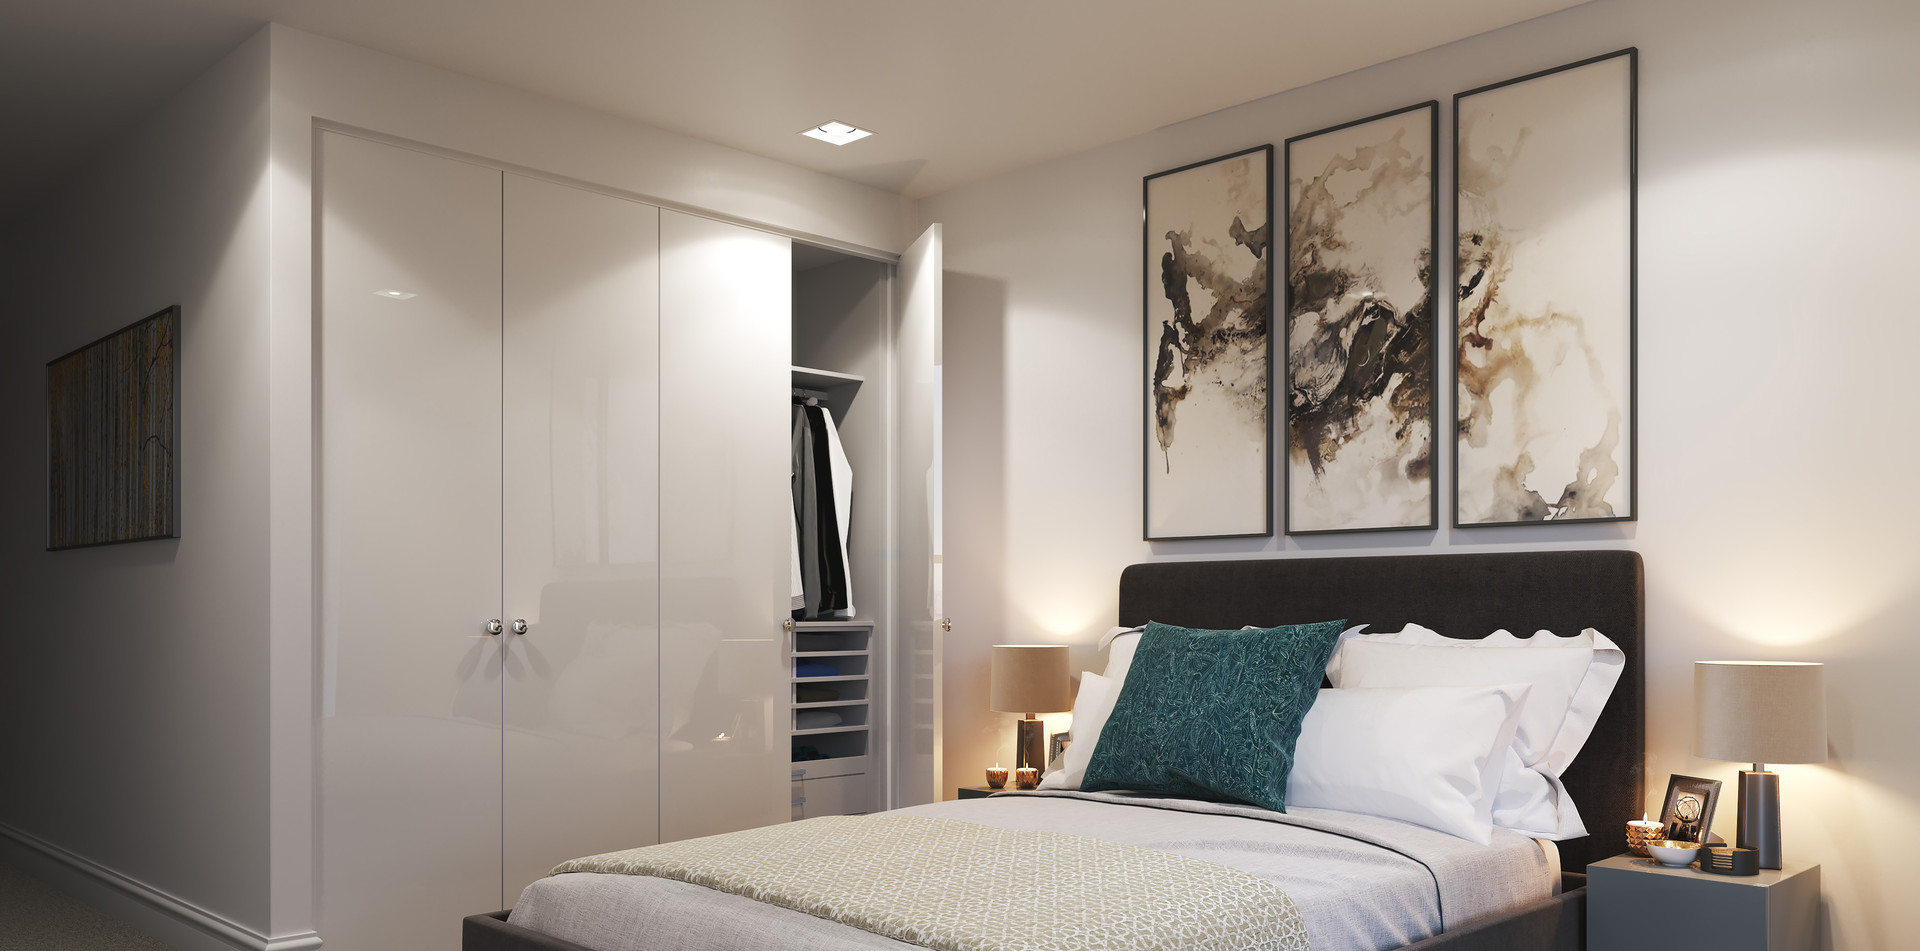 Arden Gate Residential Property Investment in Birmingham UK